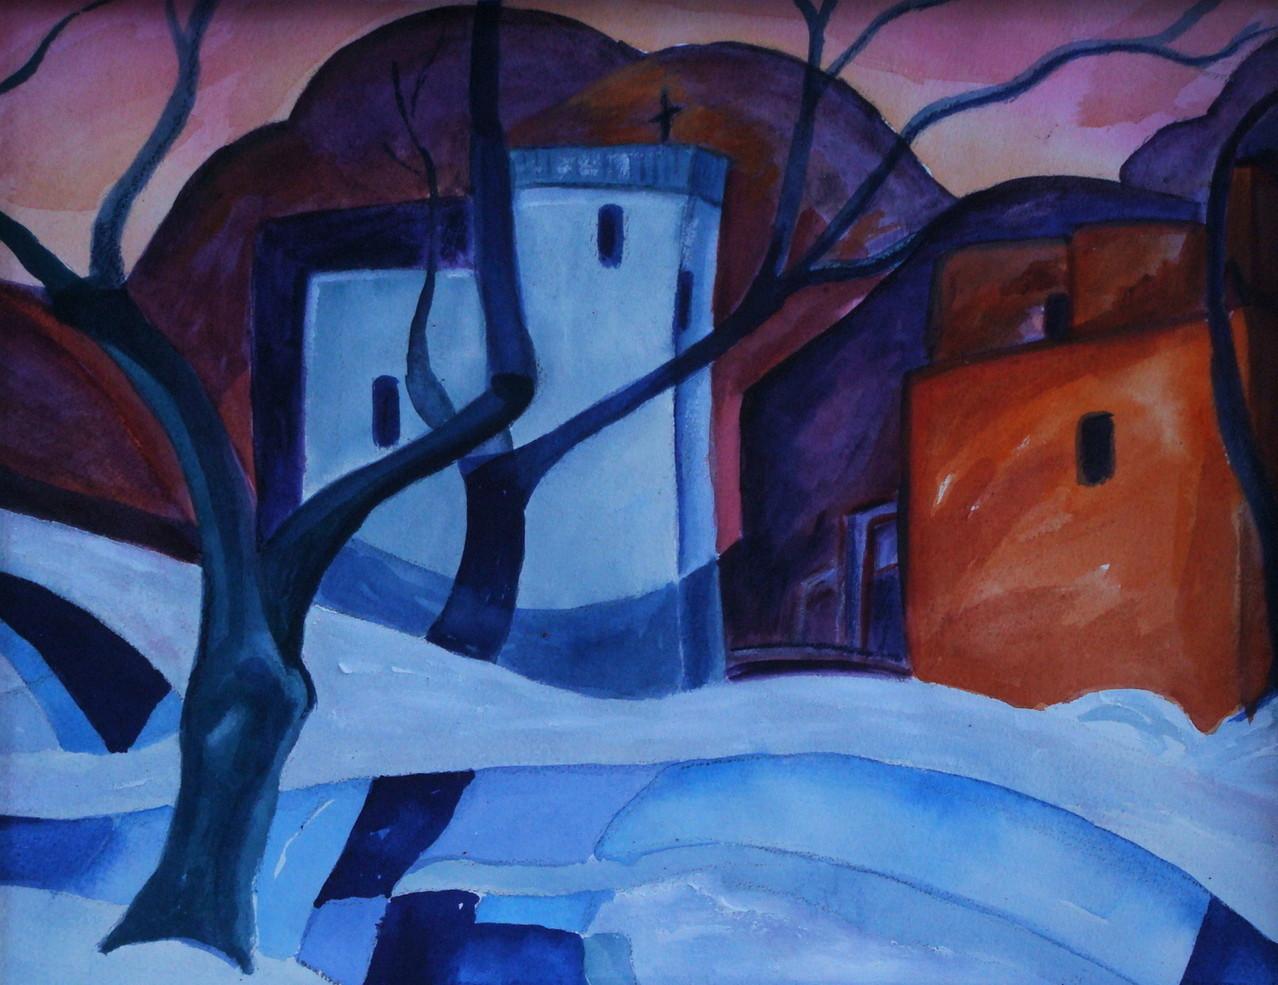 Winter's Glow, watercolor, 15.5 x 11.5, SOLD